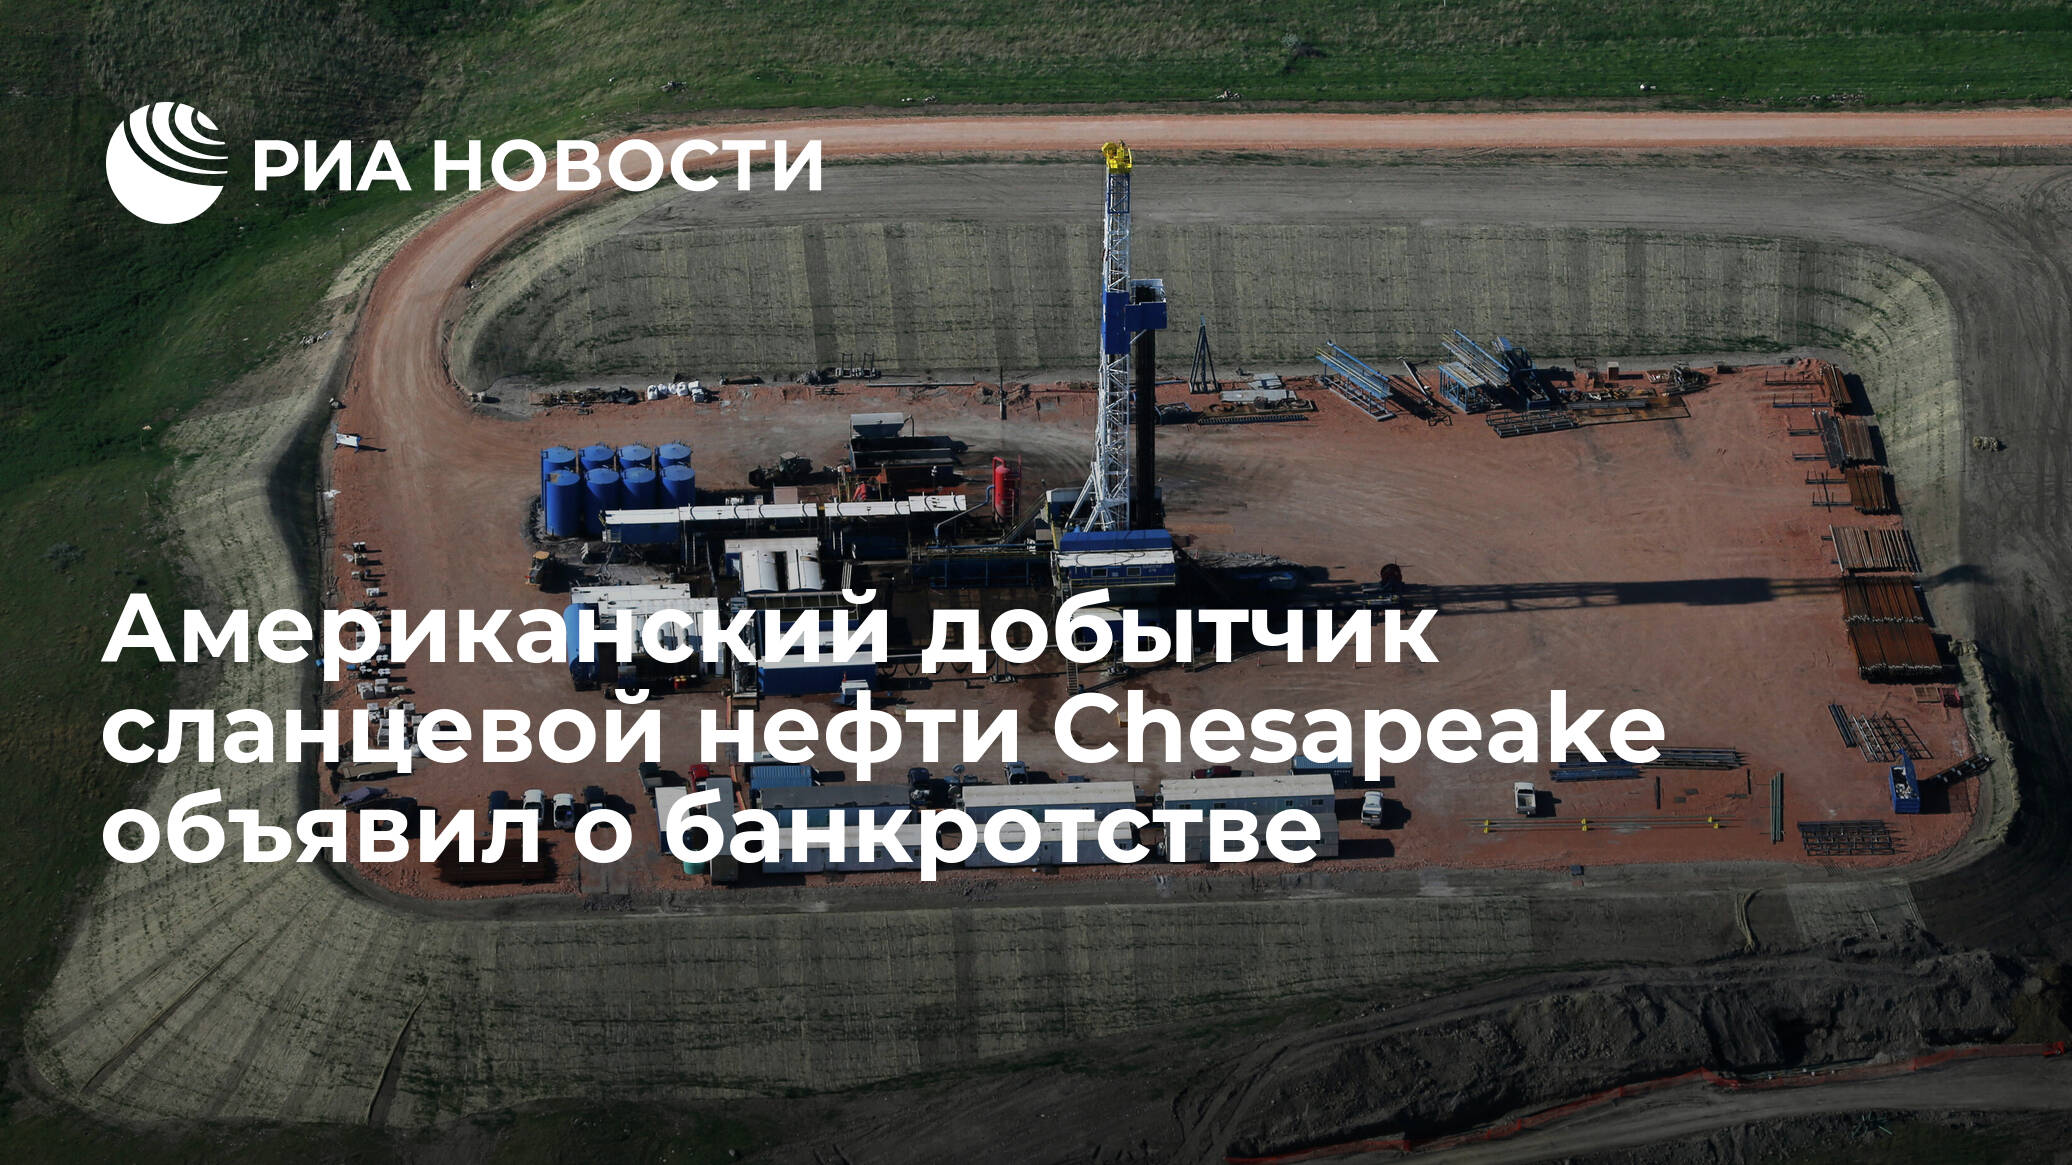 Американский добытчик сланцевой нефти Chesapeake объявил о банкротстве